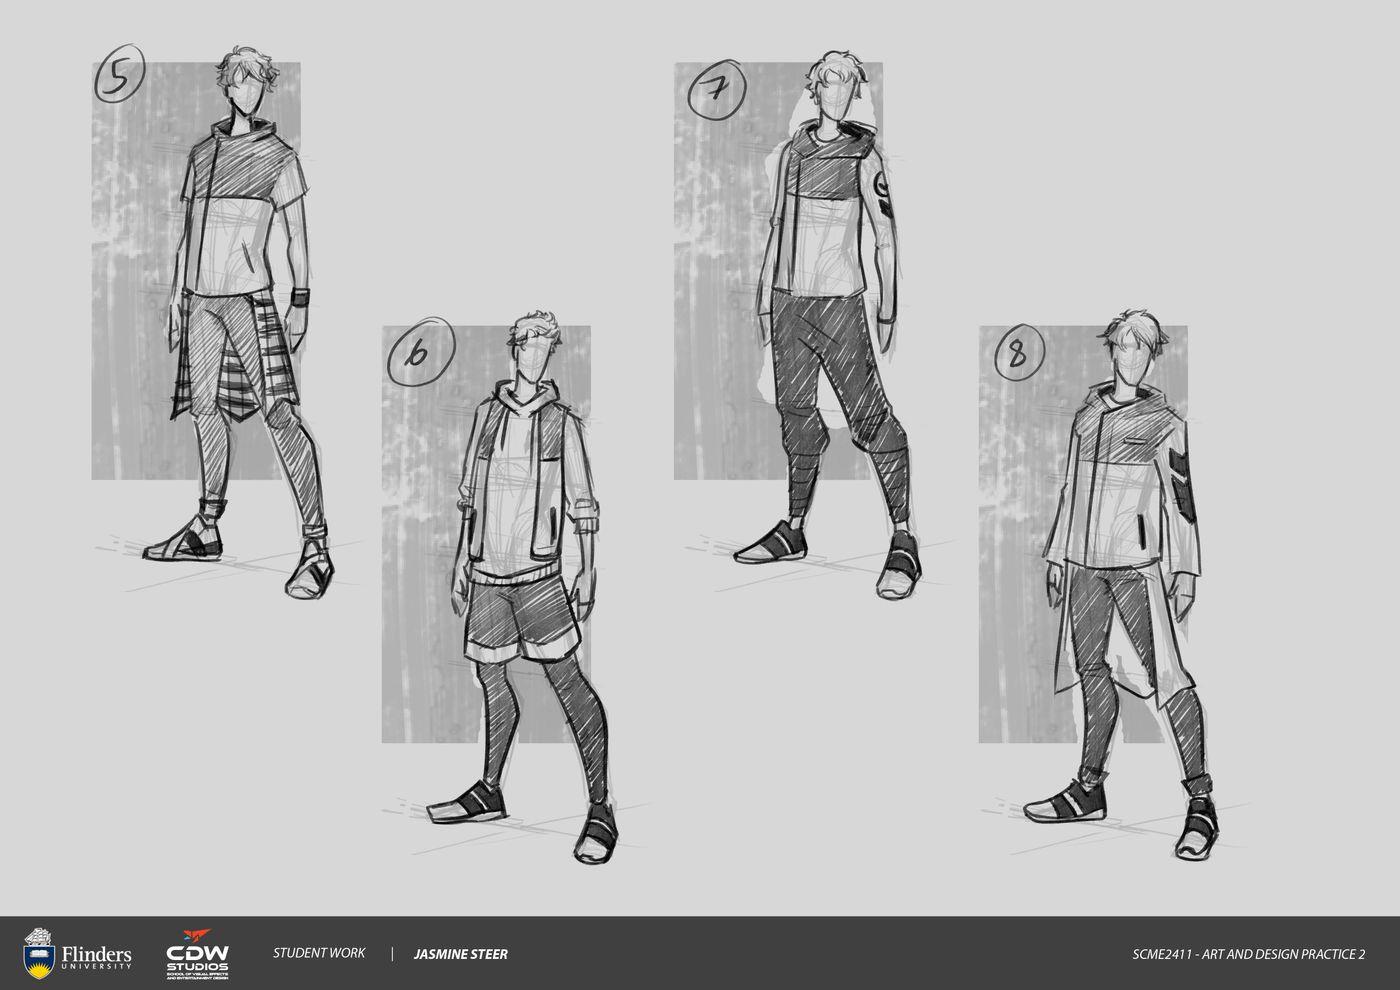 Steer Jasmine %20 Scme2411 Artand Design Practice2 Major Project %20 Thumbnails02 Jasminesteer